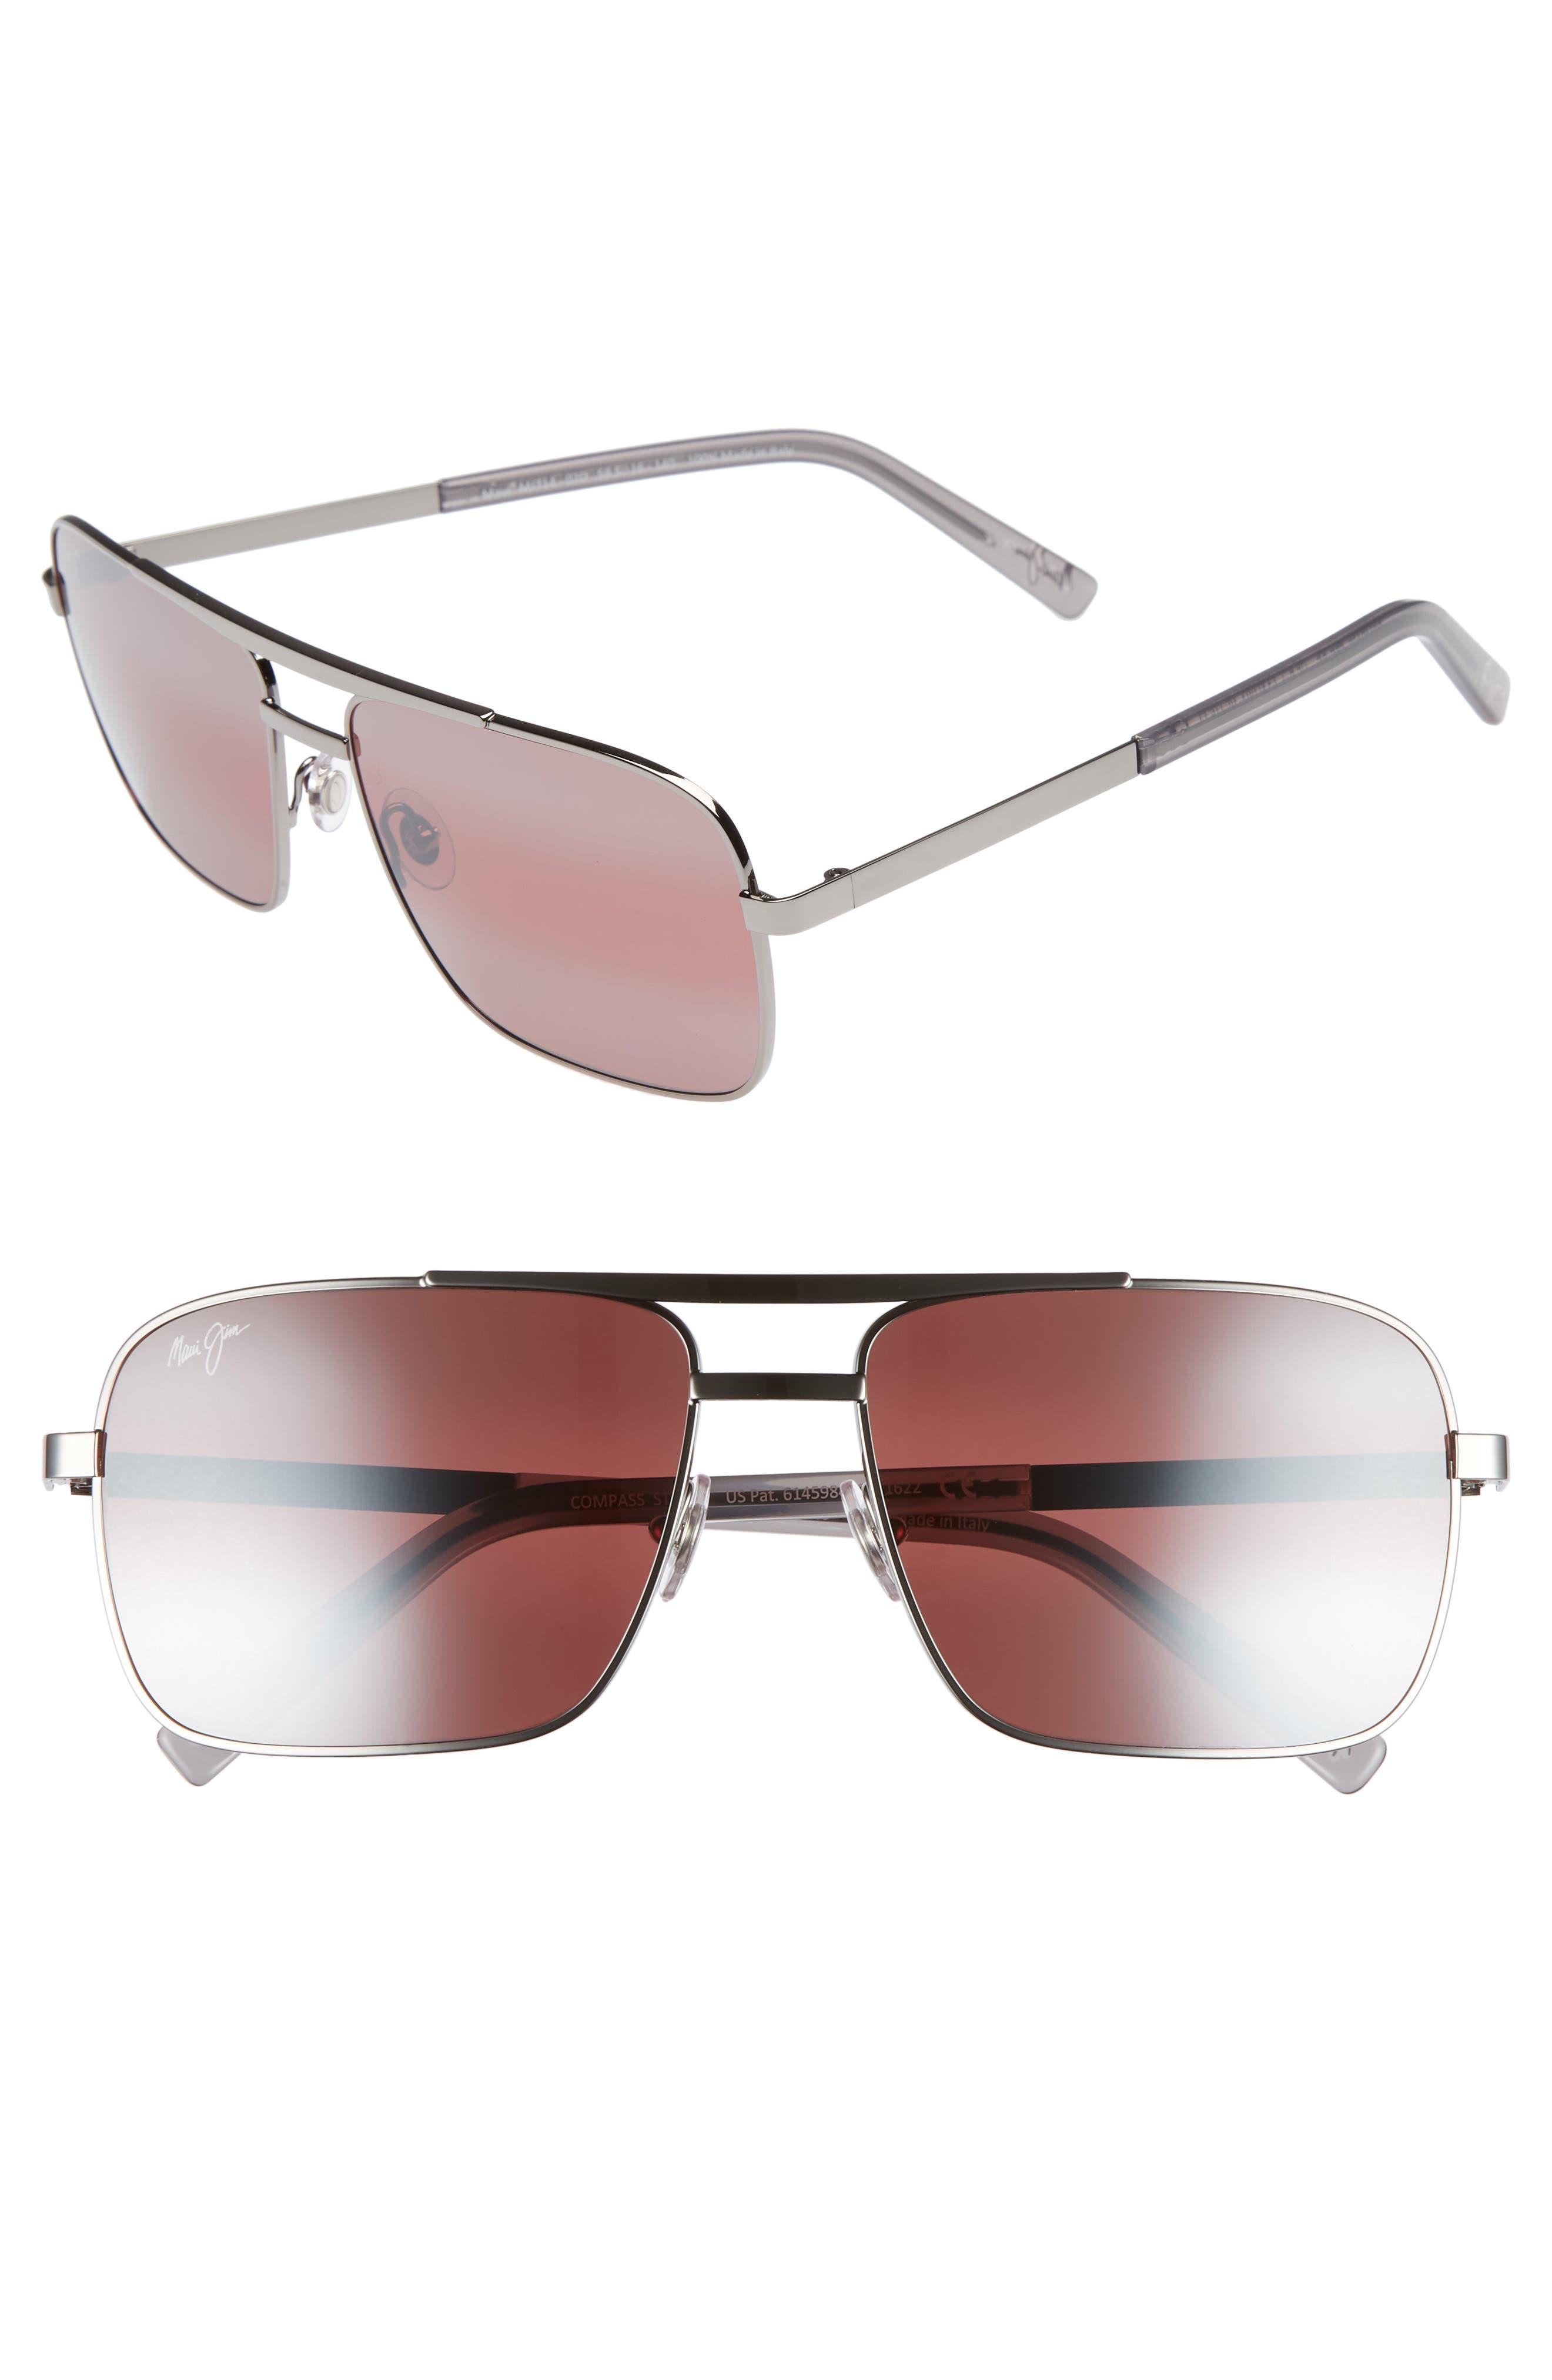 Compass 60mm Polarized Aviator Sunglasses,                         Main,                         color, Silver/ Neutral Grey